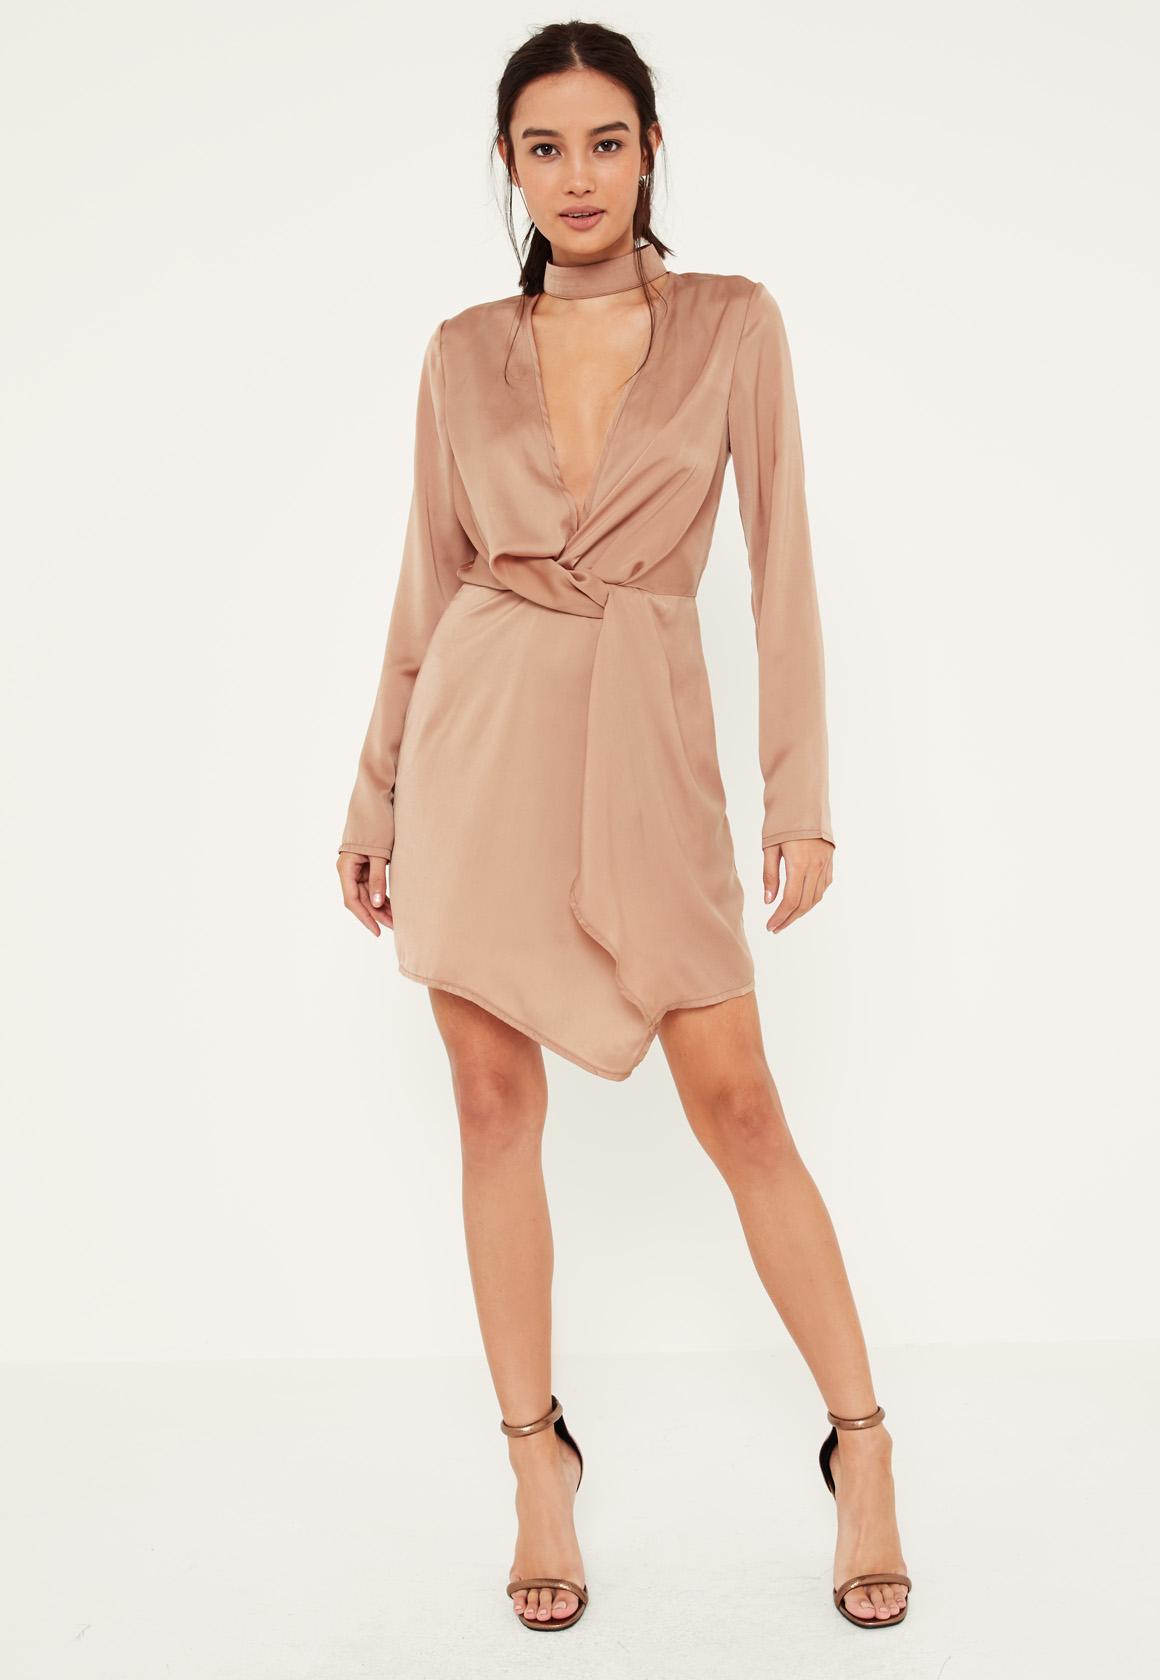 Nude Satin Wrap Choker Shift Dress